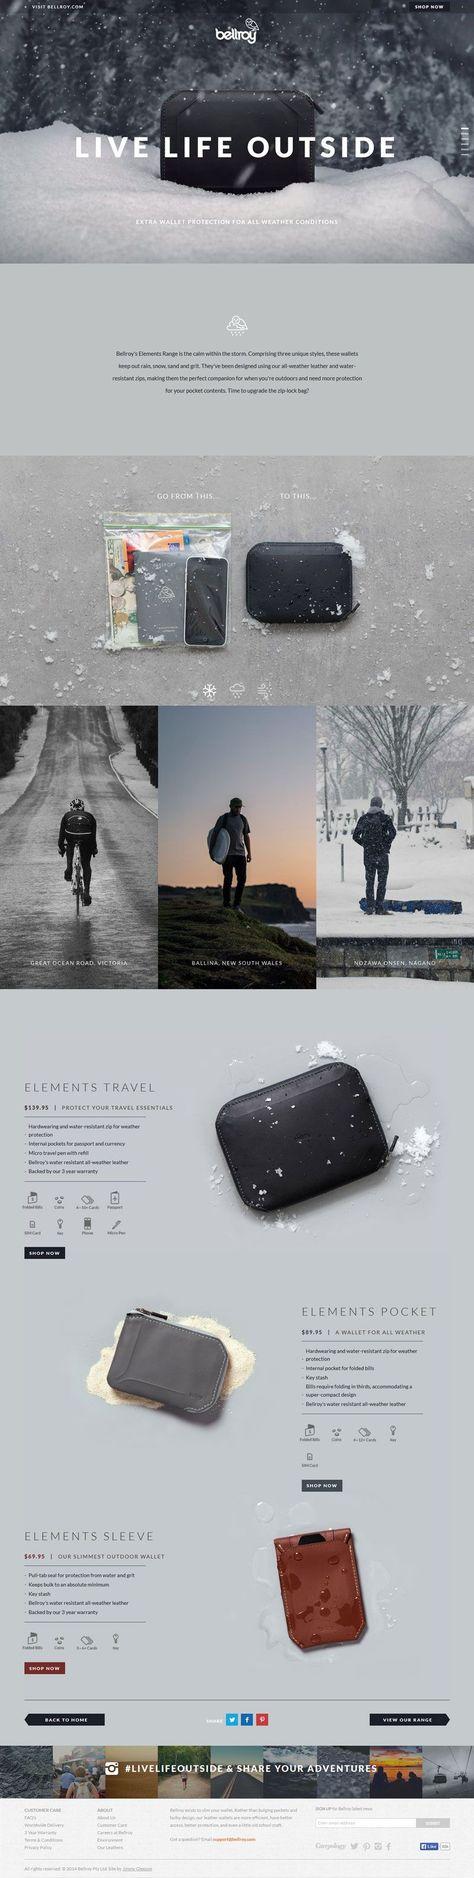 creativity Stunning lifestyle images...